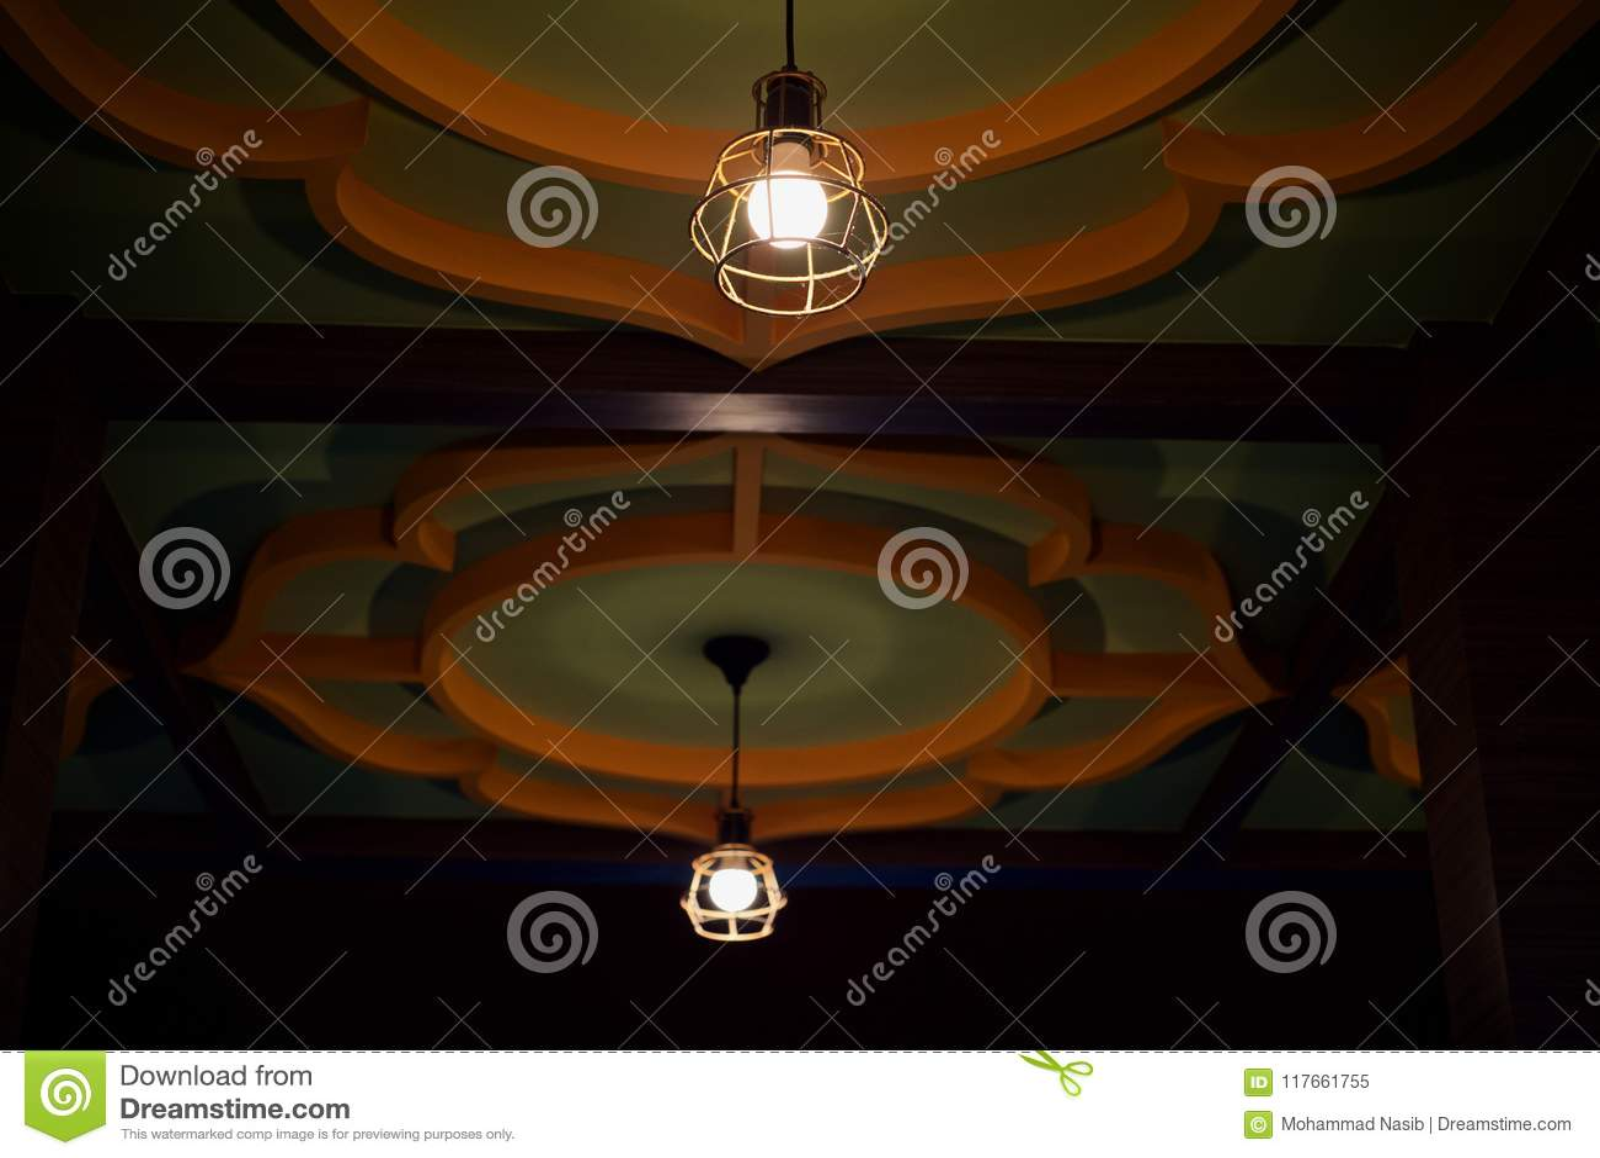 Download Stylish Interior Restaurant Ceiling Lights Unique Photo Stock Image - Image of image, design: 117661755